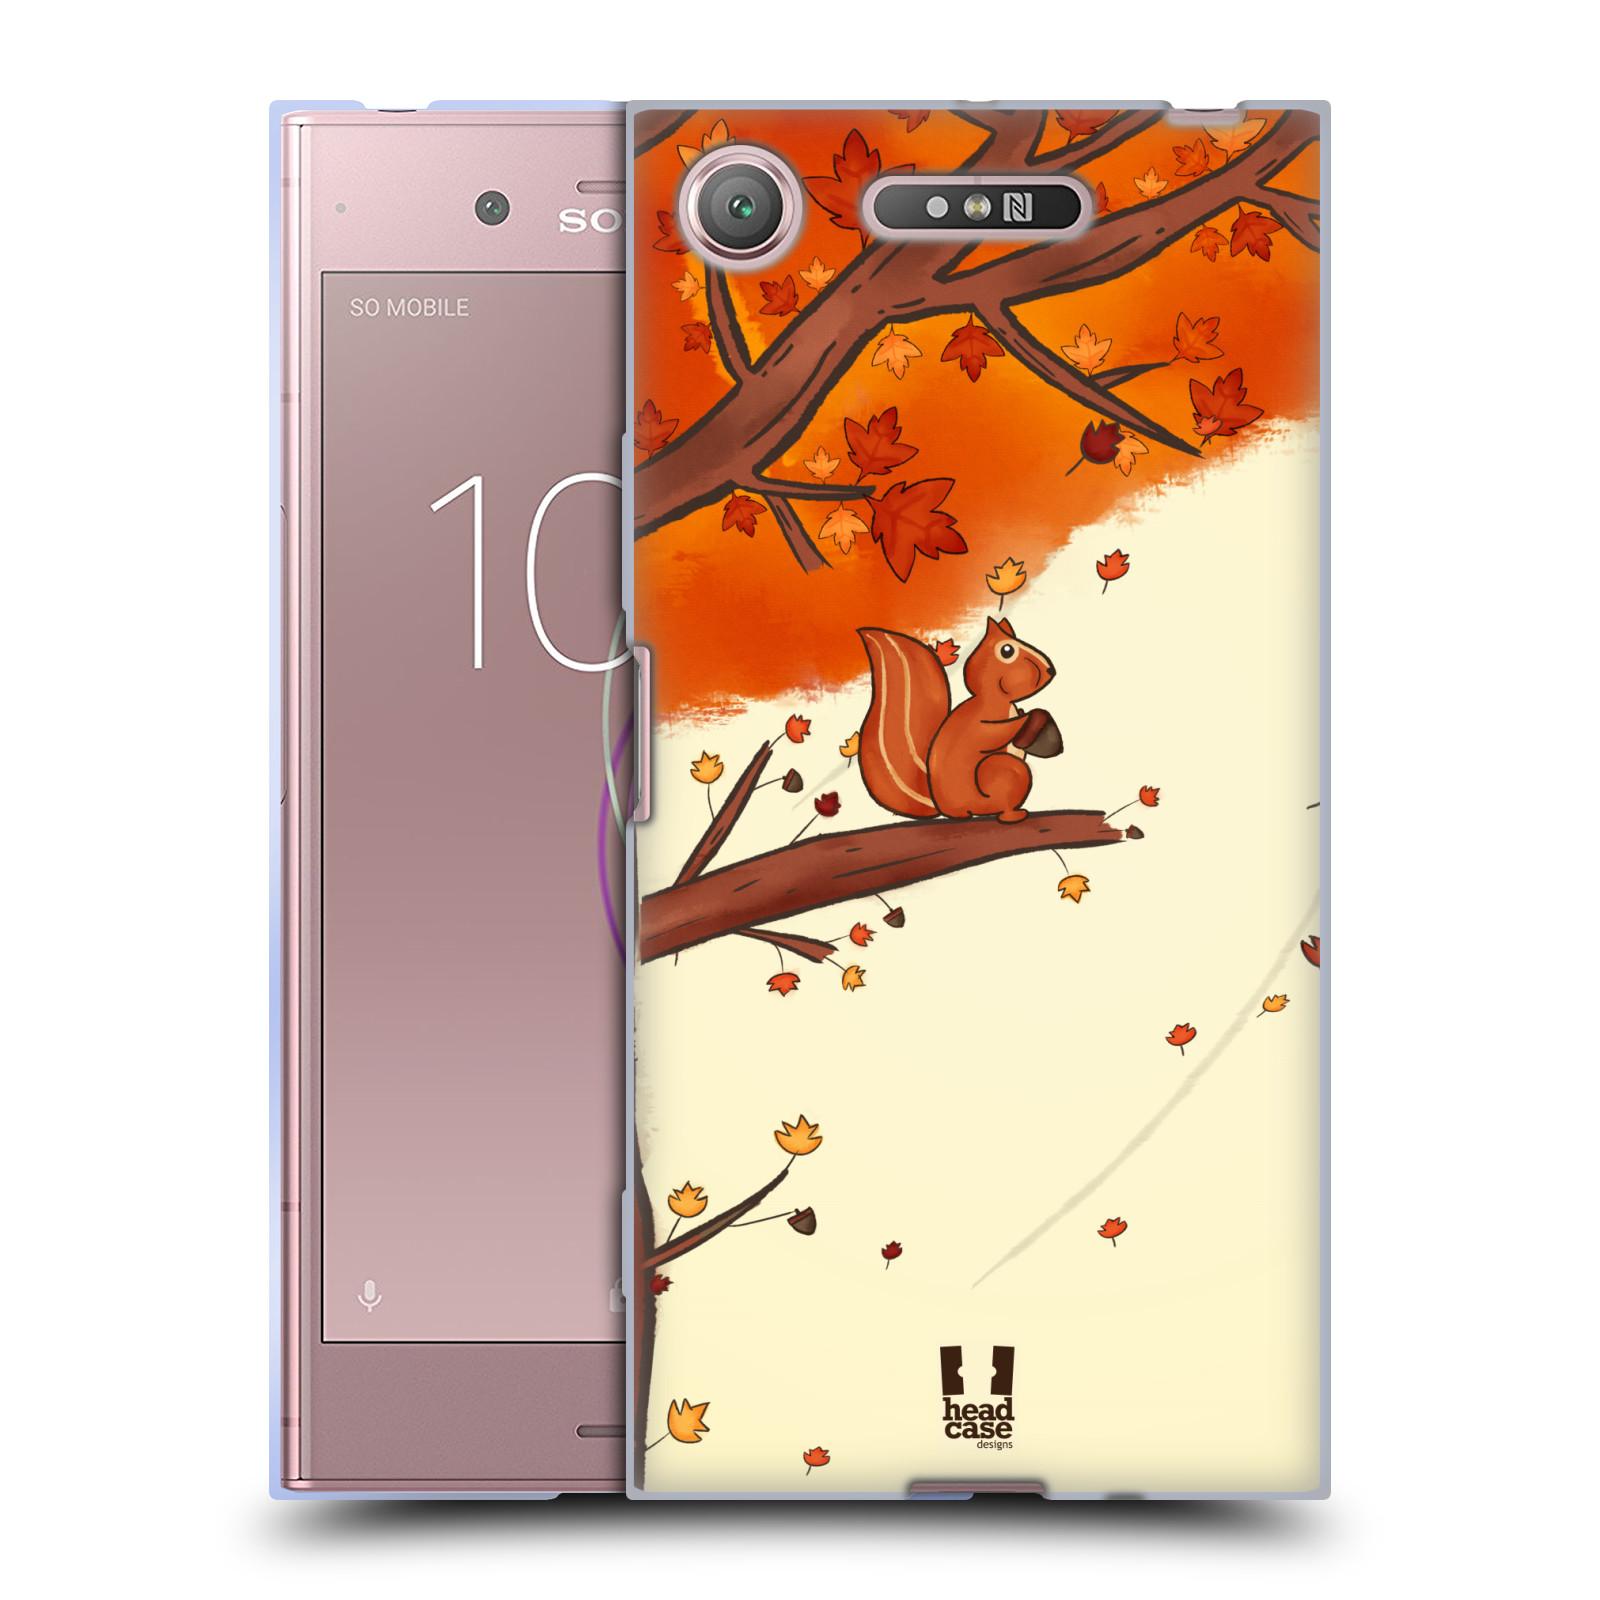 Silikonové pouzdro na mobil Sony Xperia XZ1 - Head Case - PODZIMNÍ VEVERKA